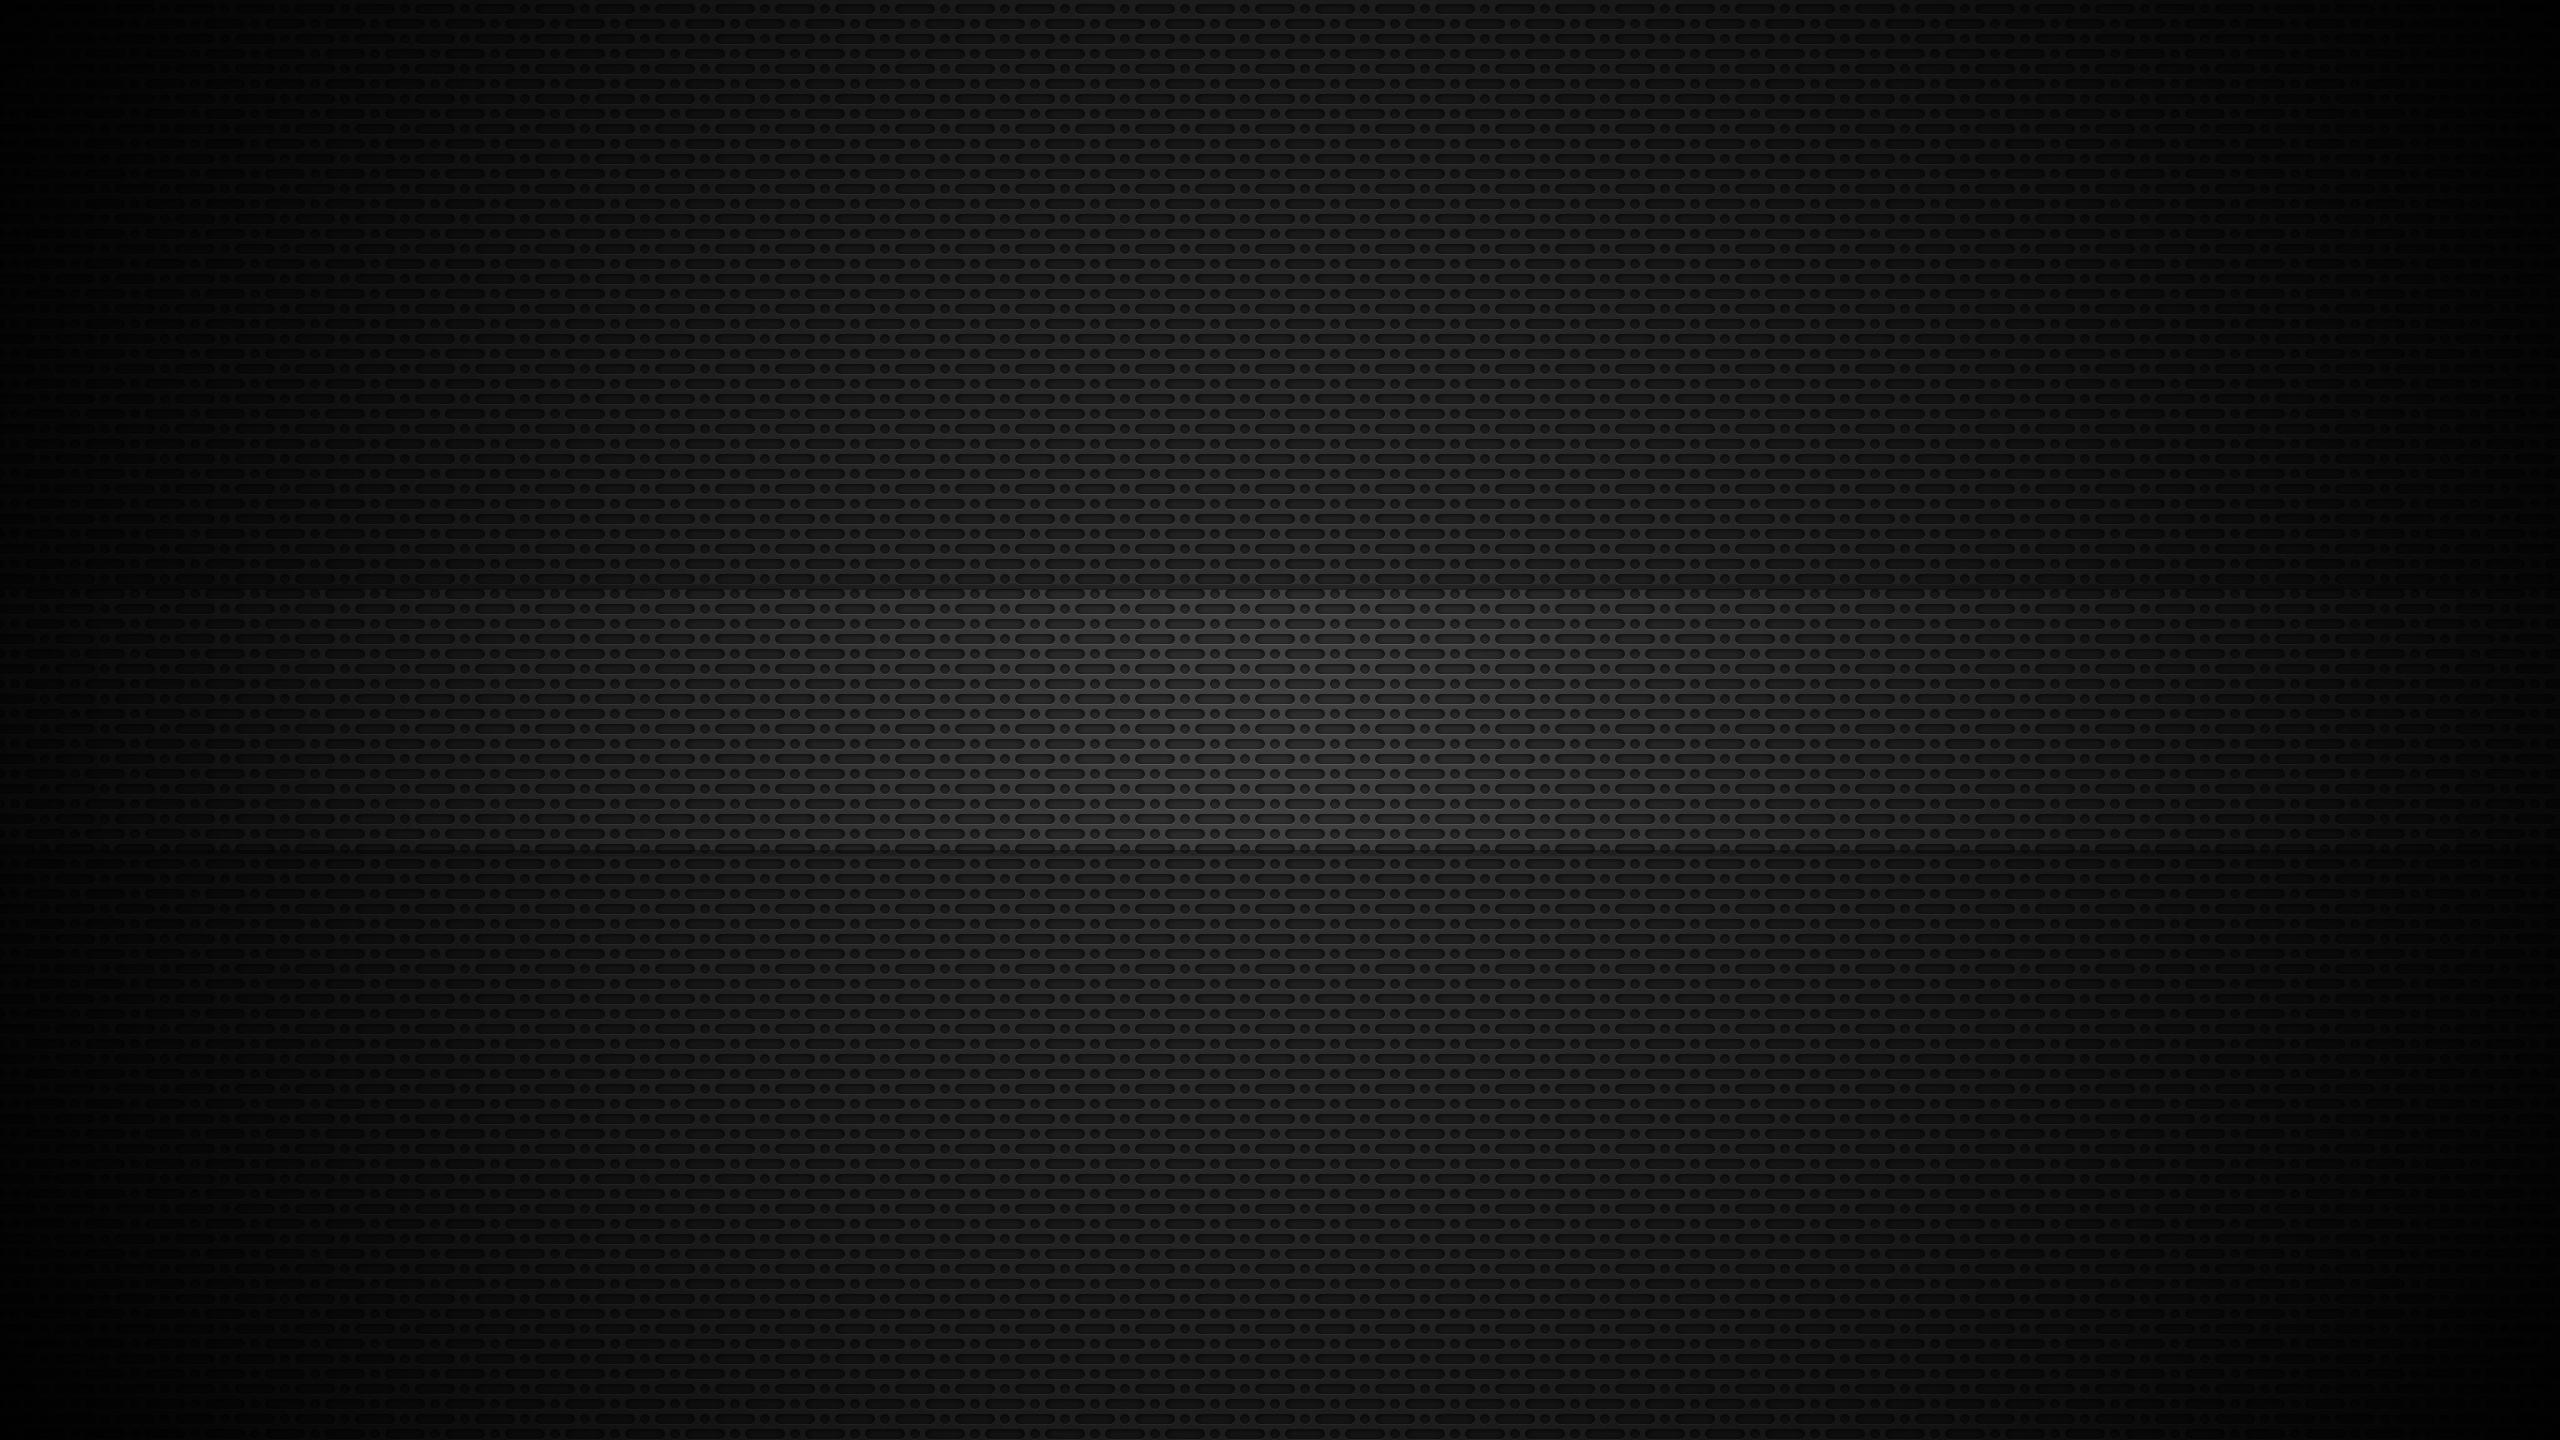 Youtube clipart wallpaper Clipart clipart 2560x1440 Black &